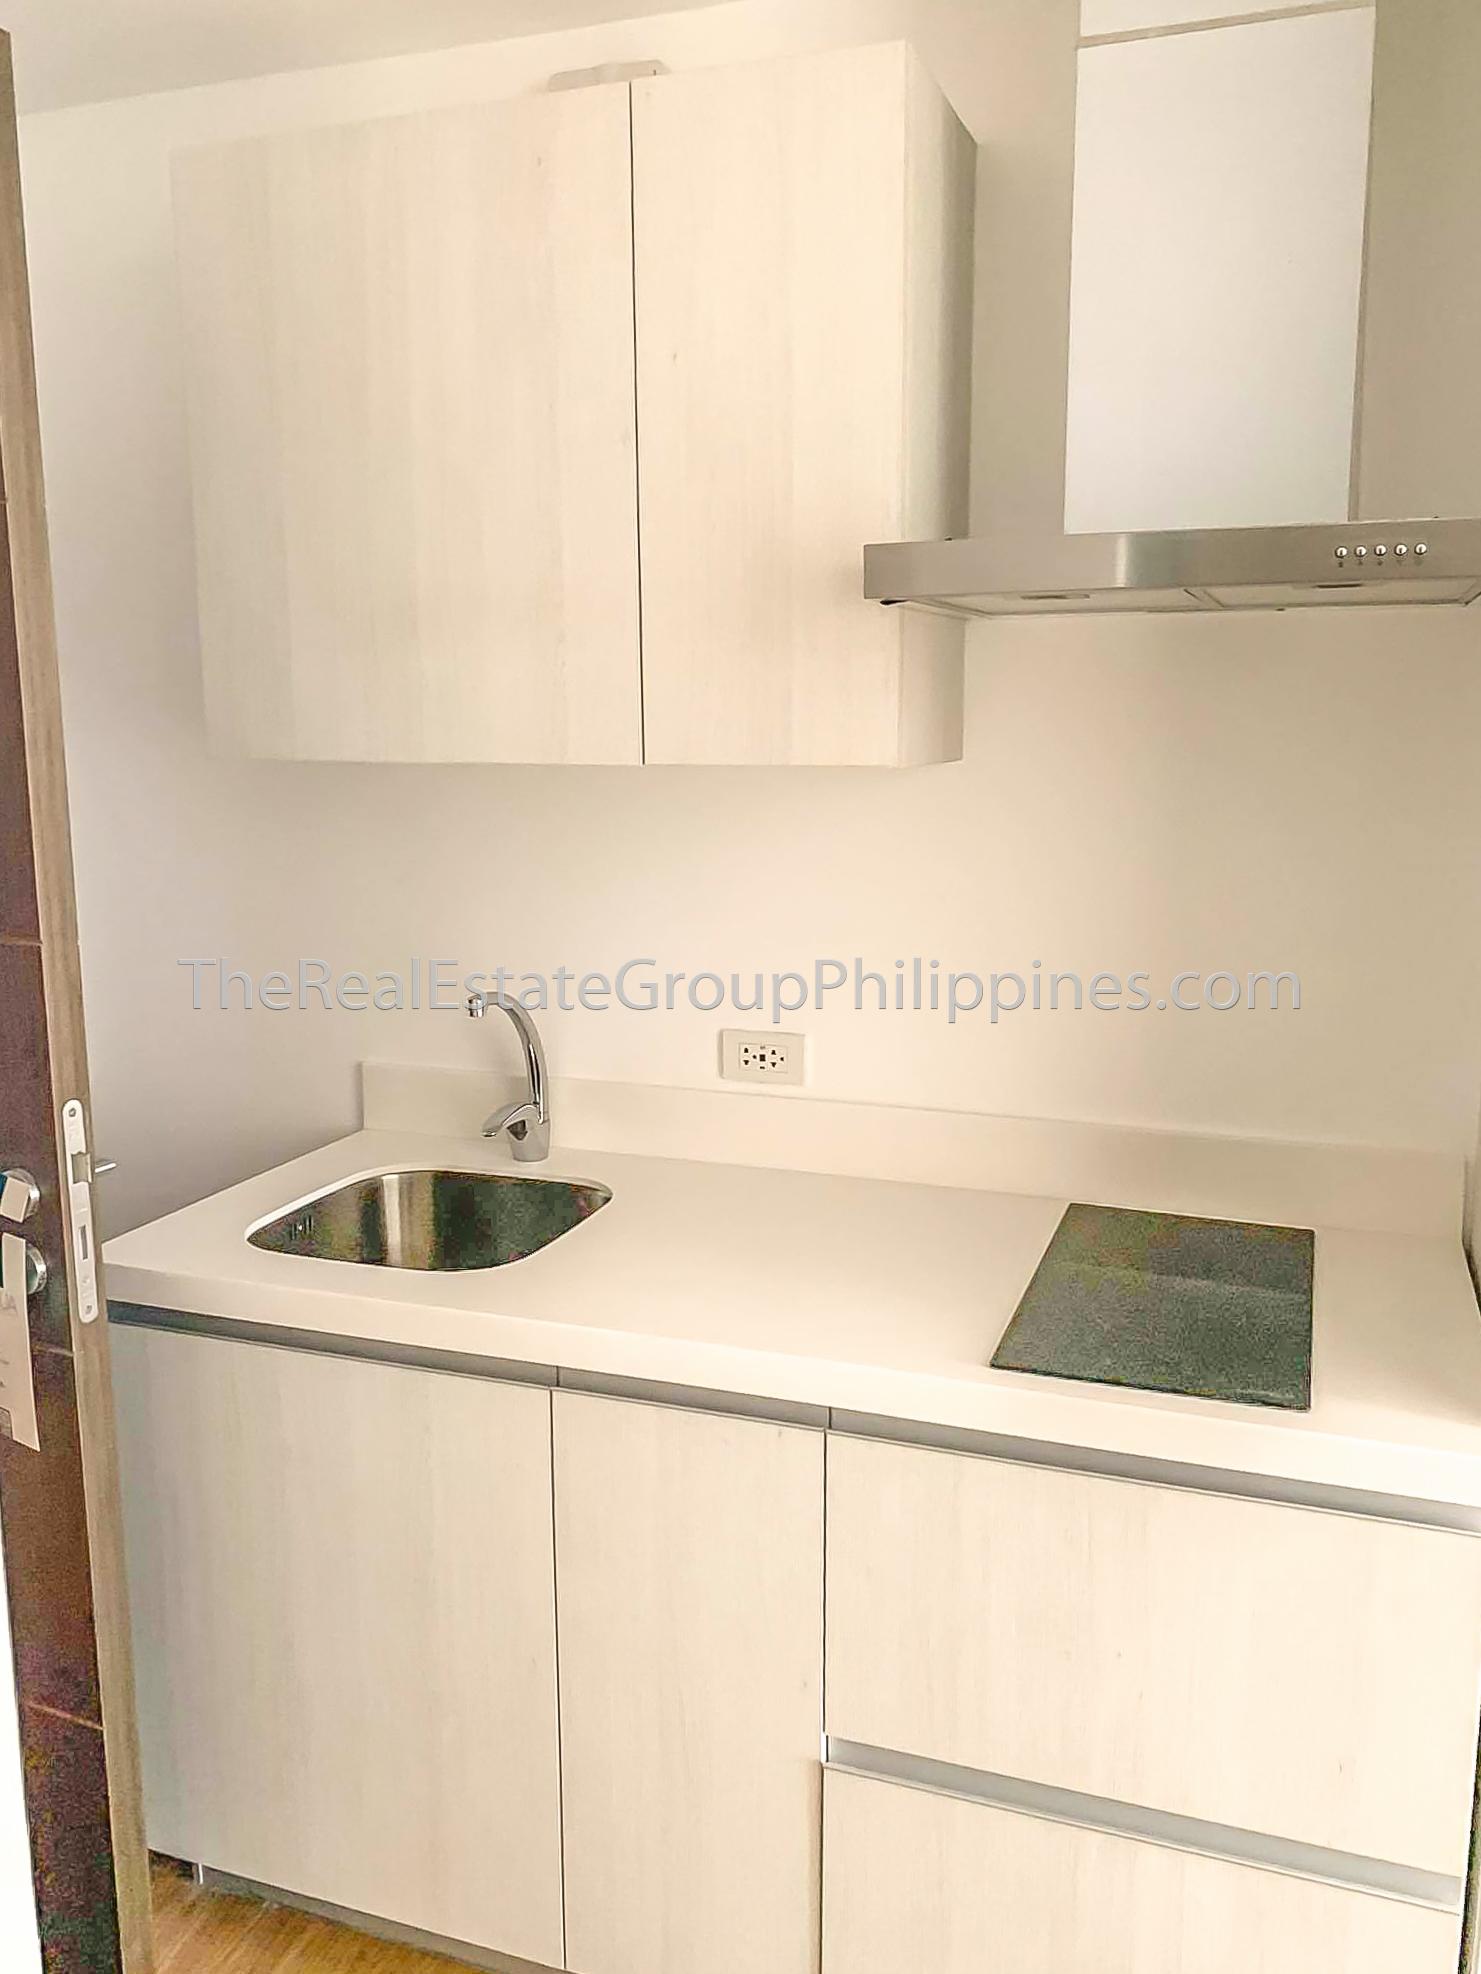 Studio Condo For Sale Novotel Acqua Residences Mandaluyong-10